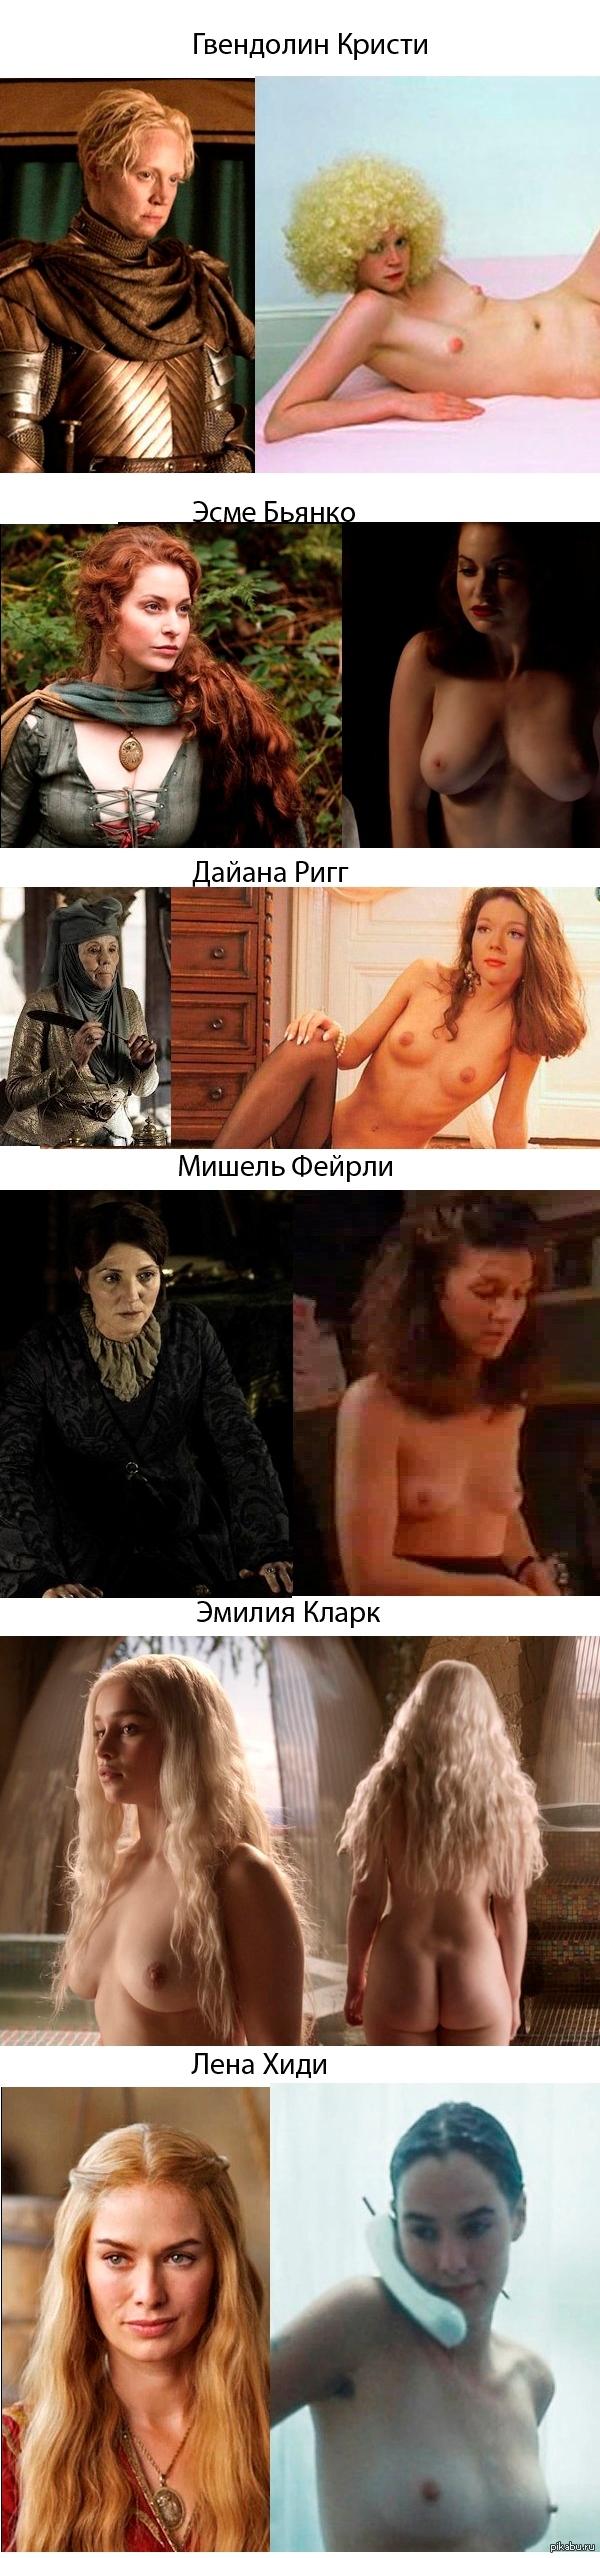 porno-video-s-igri-prestolov